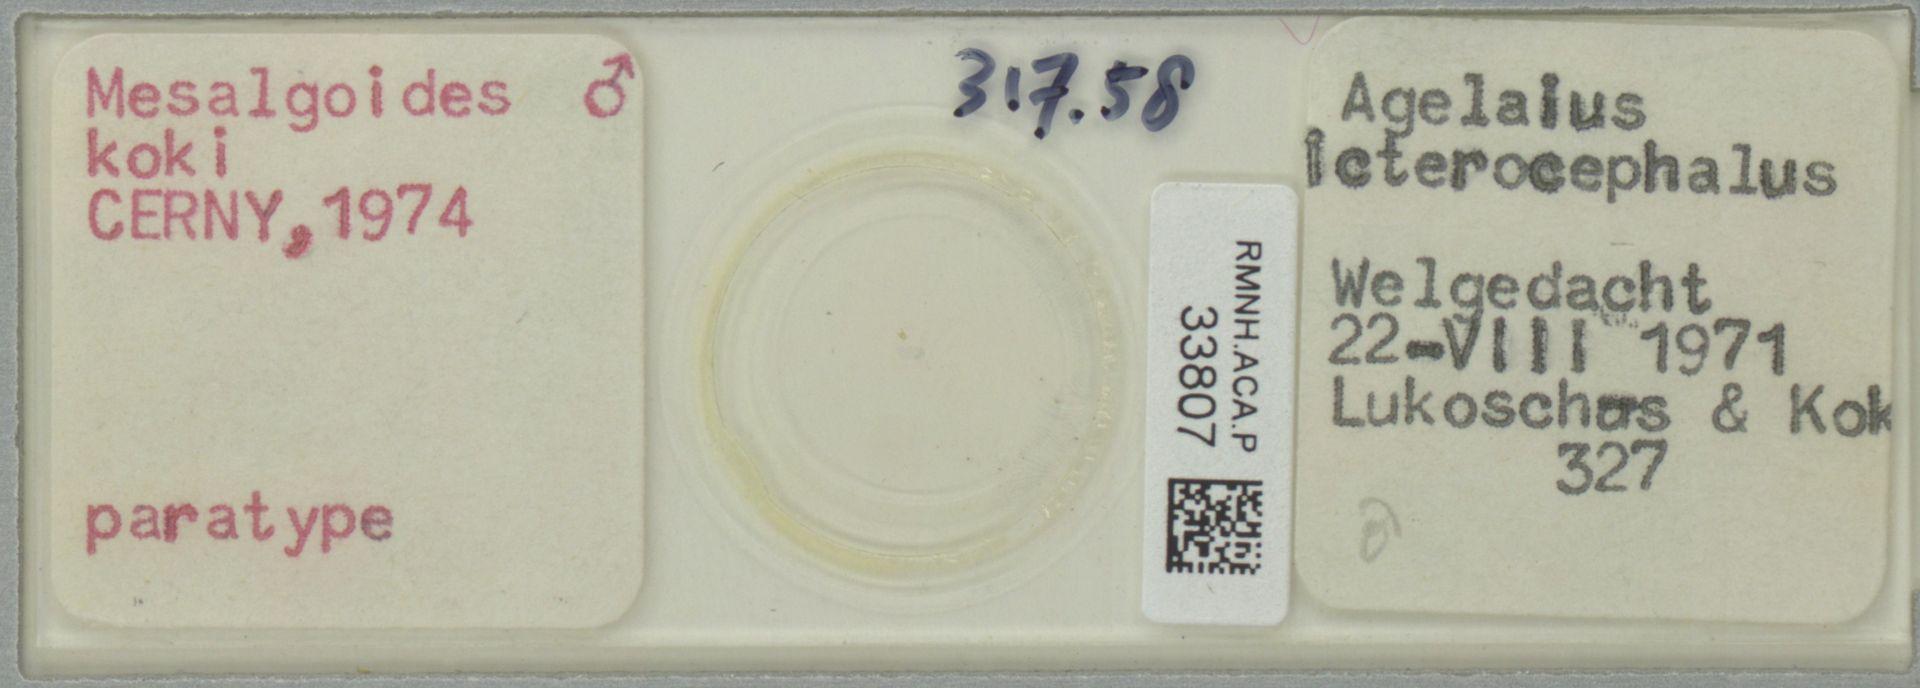 RMNH.ACA.P.33807   Mesalgoides koki Cerny, 1974